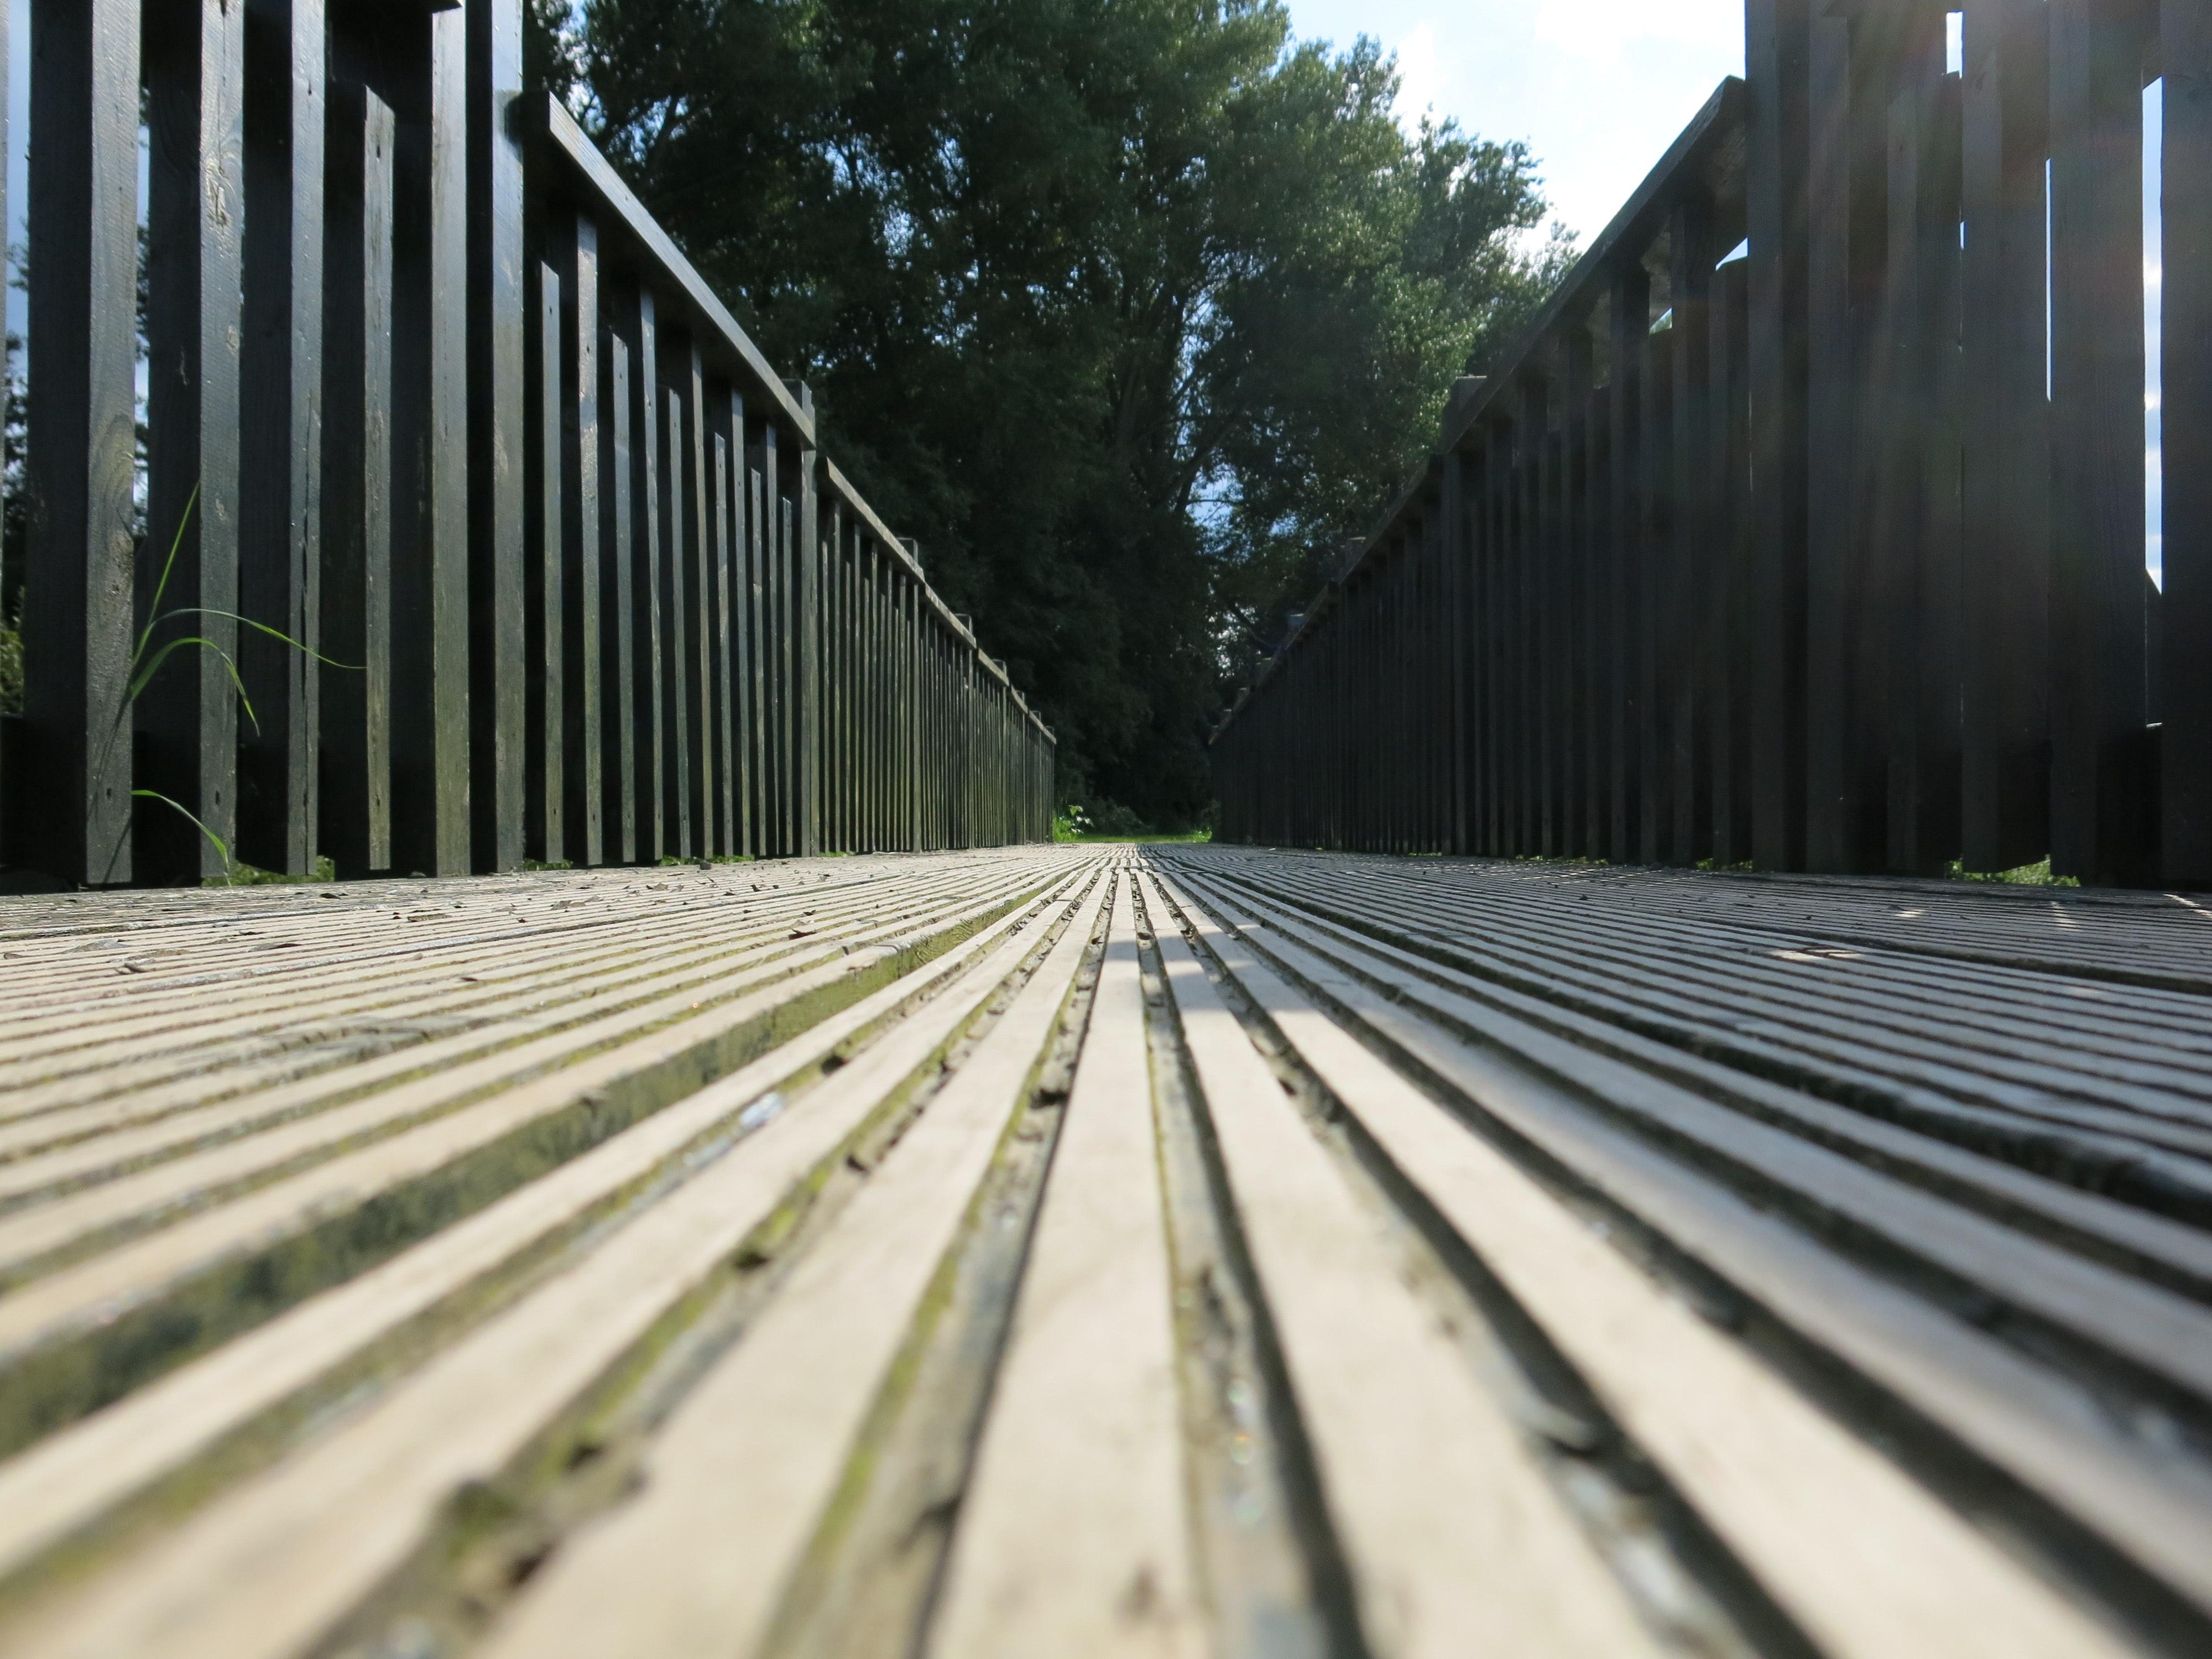 Brown Wooden Bridge, Pattern, Railings, Wood, Outdoors, HQ Photo